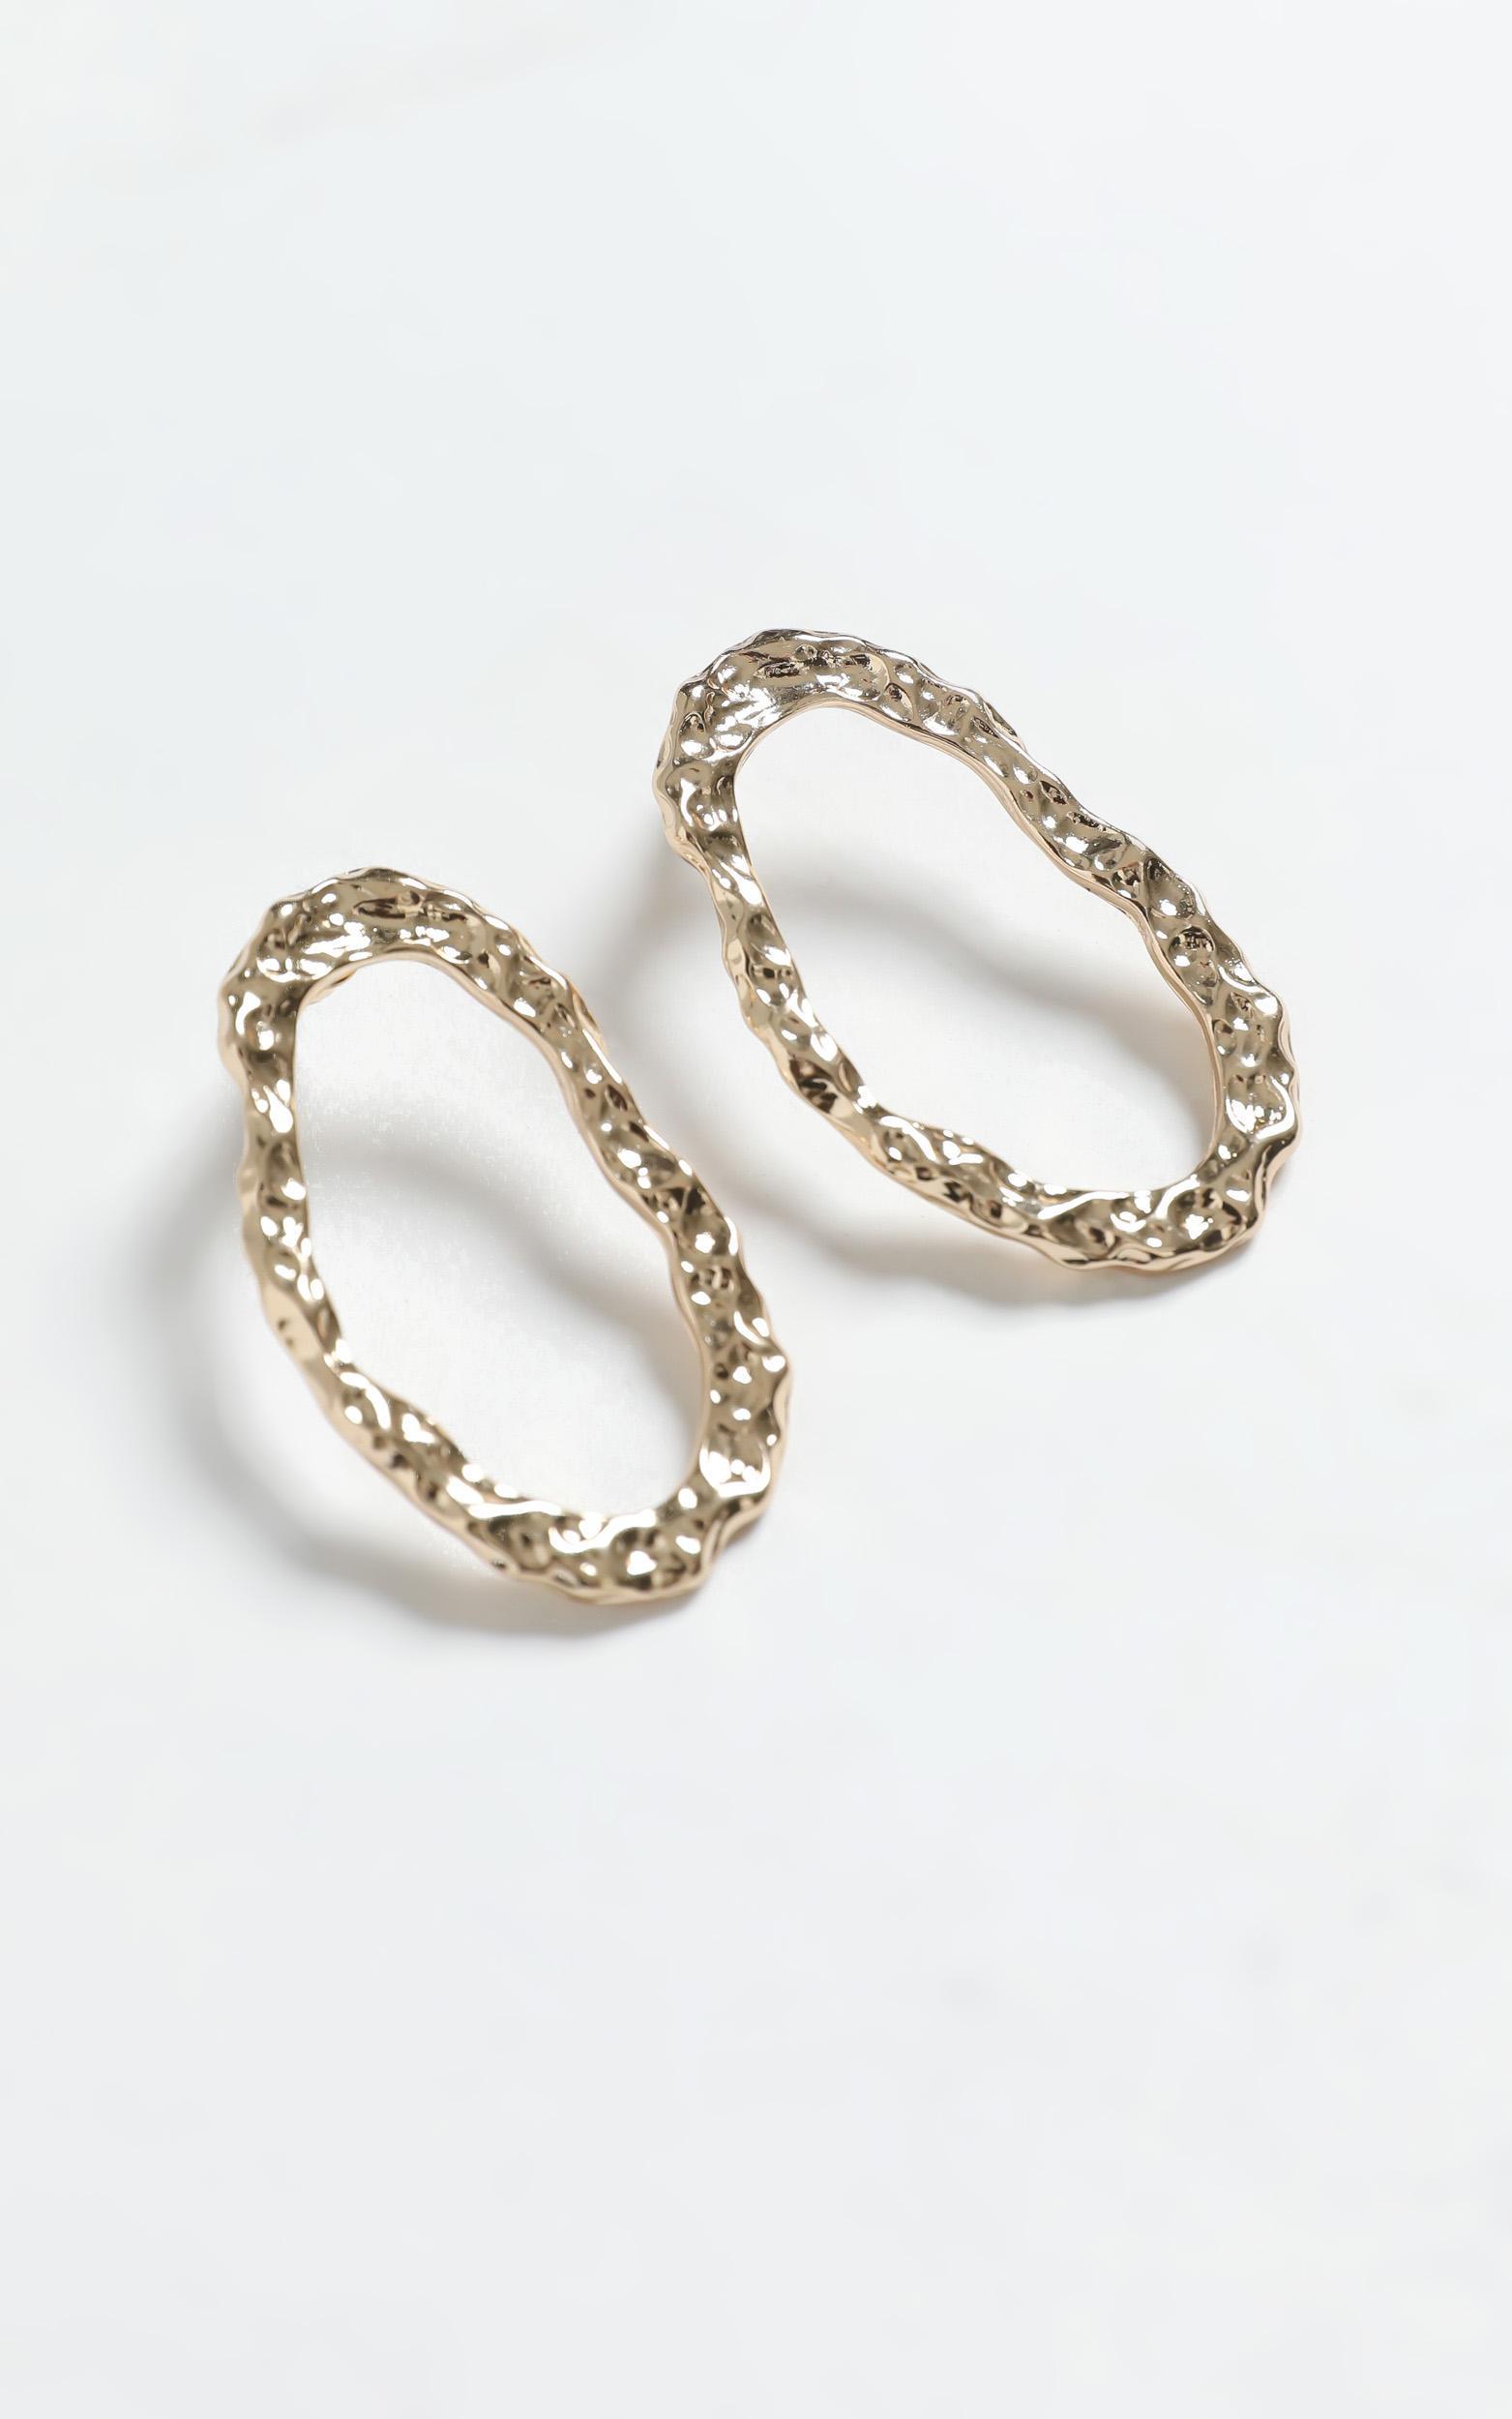 Inge Earrings in Gold, , hi-res image number null